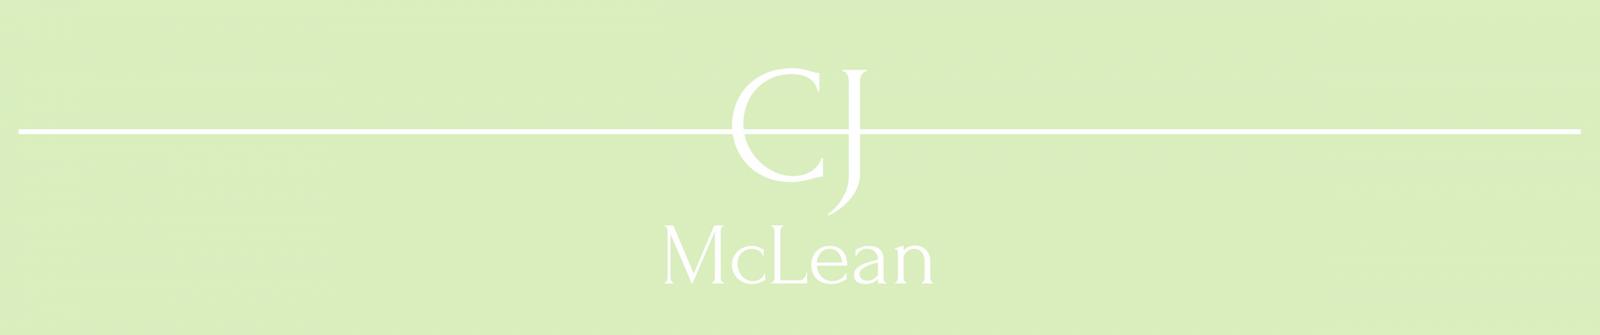 CJ McLean